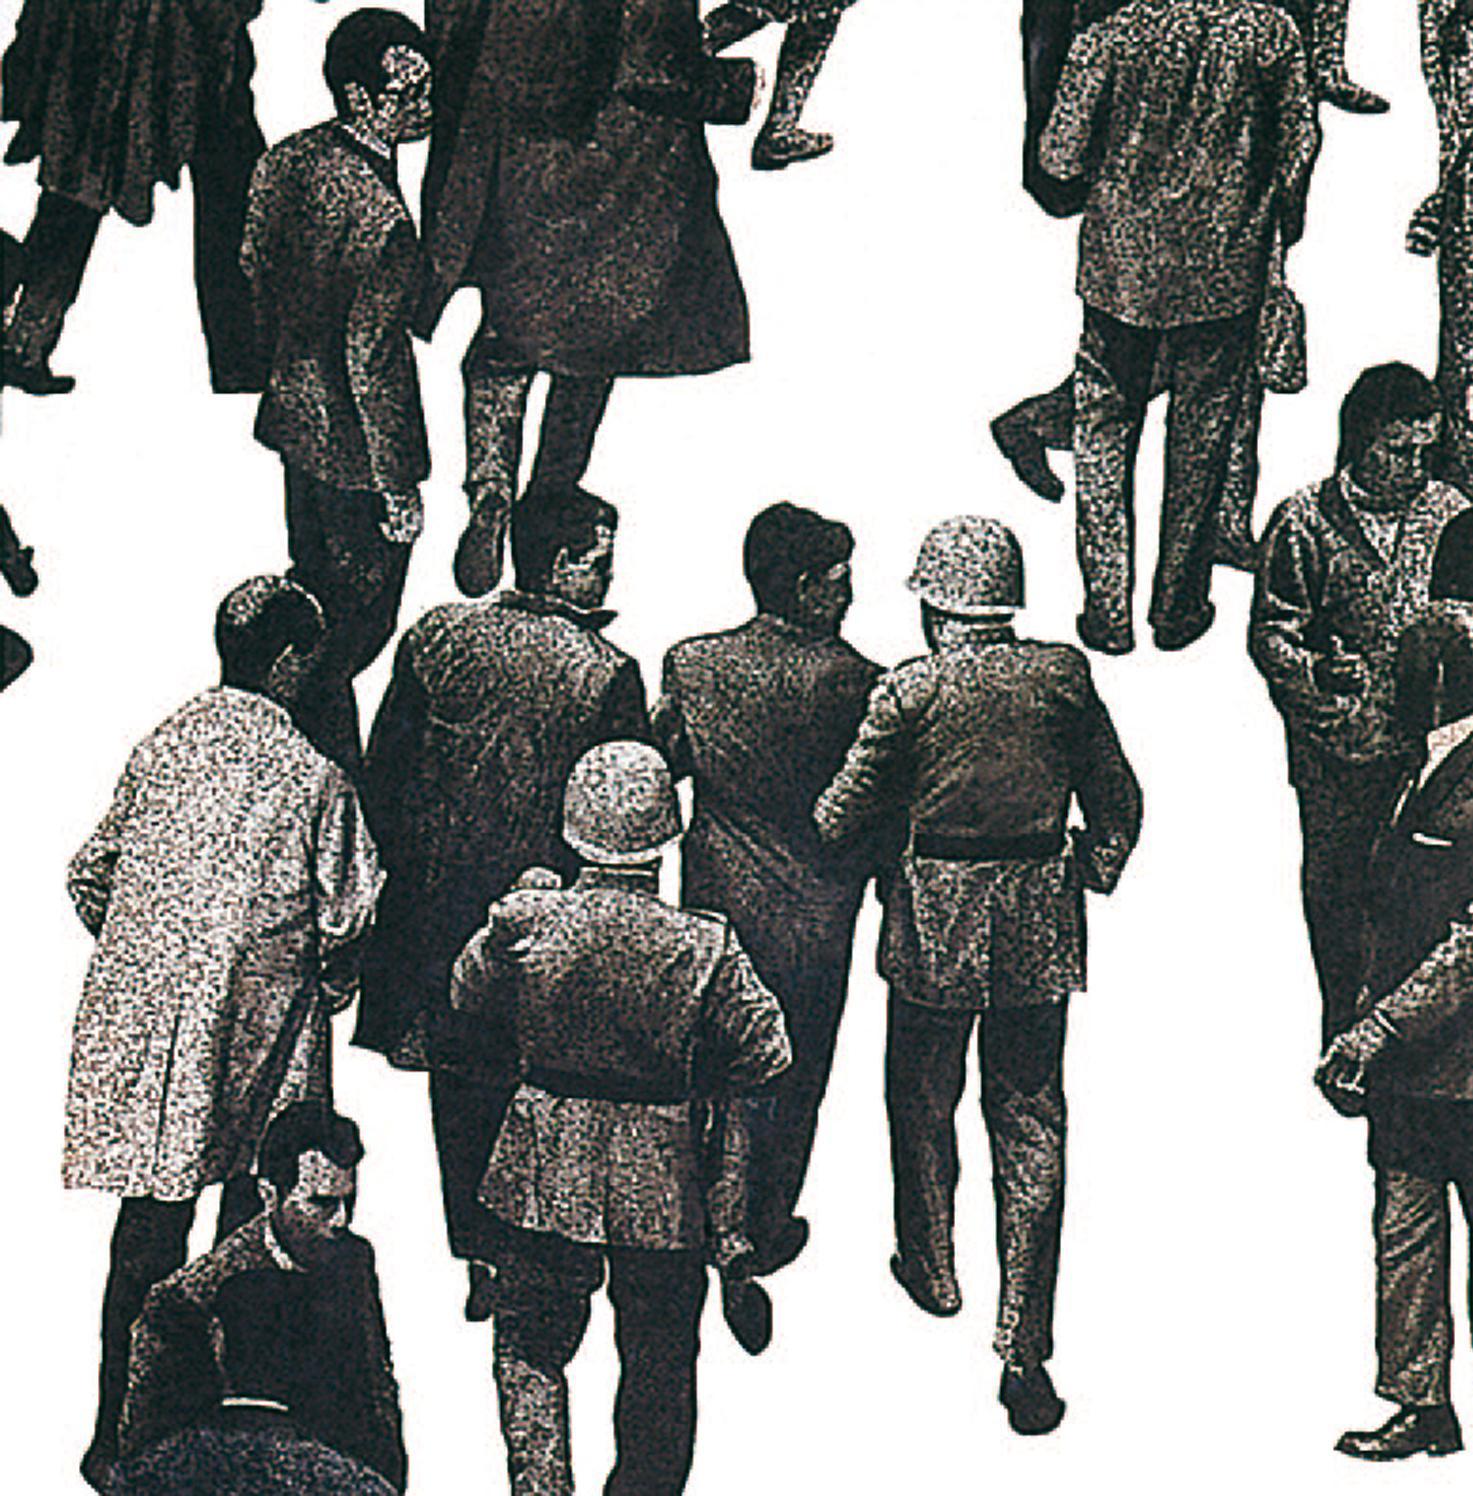 Juan Genovés en la calle, 1975